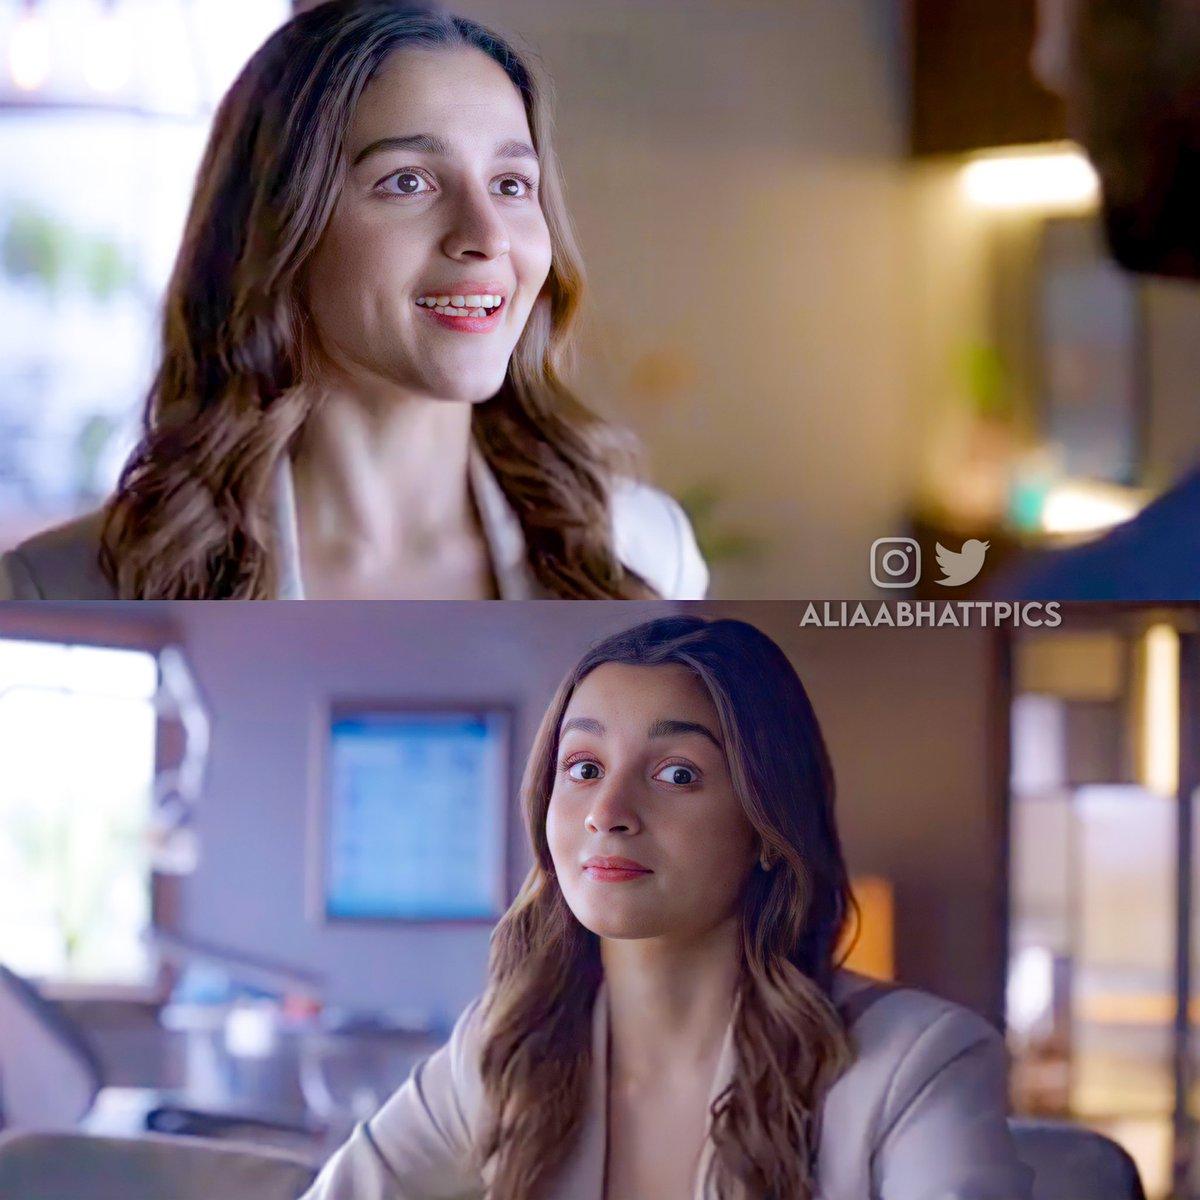 Alia Bhatt For #ViccoLabs . #AliaBhatt #advertisement #Smile